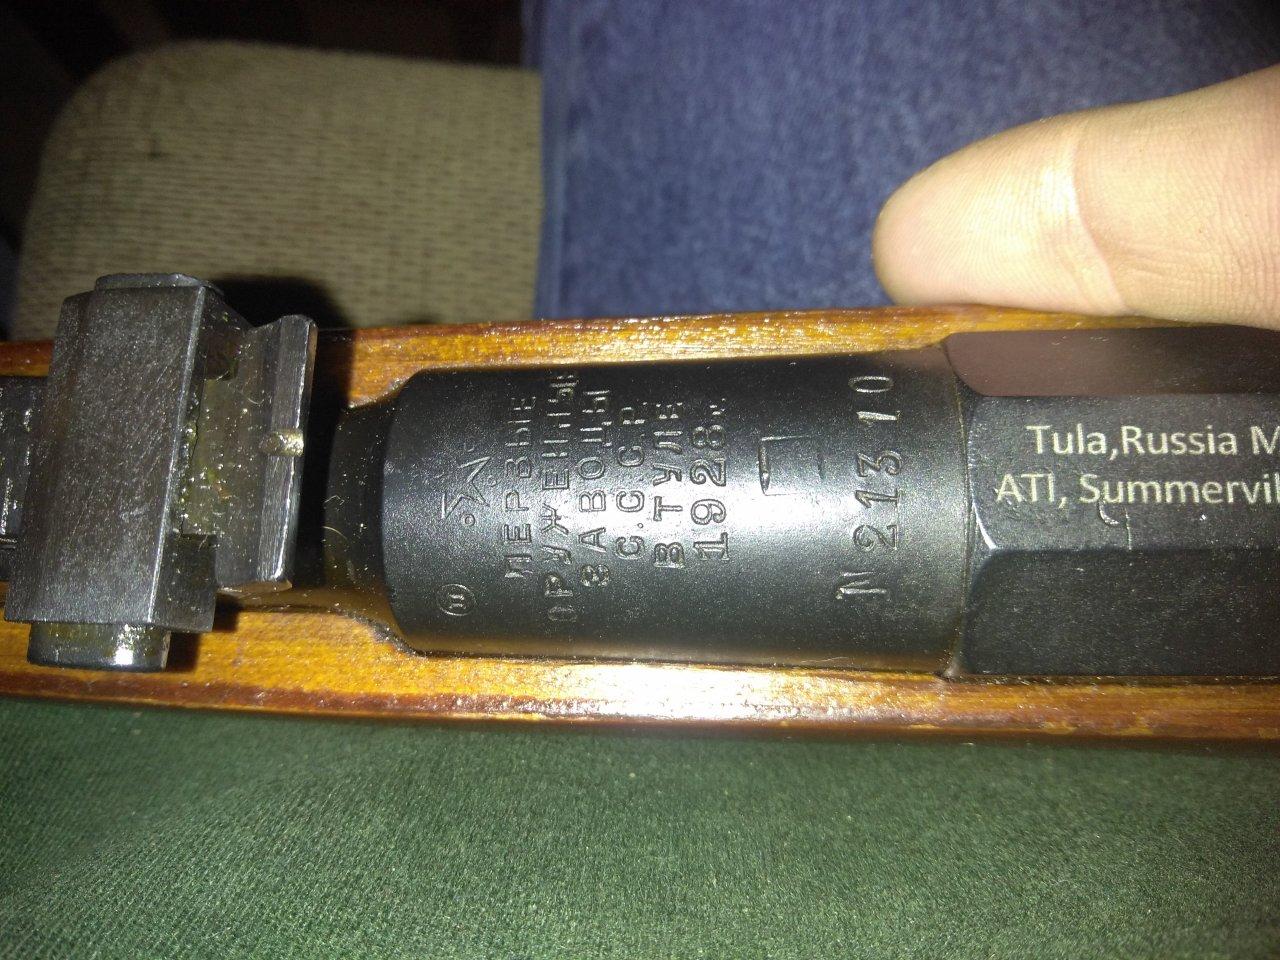 1928 Russian Tula M91/30 1928 | Gun Values Board